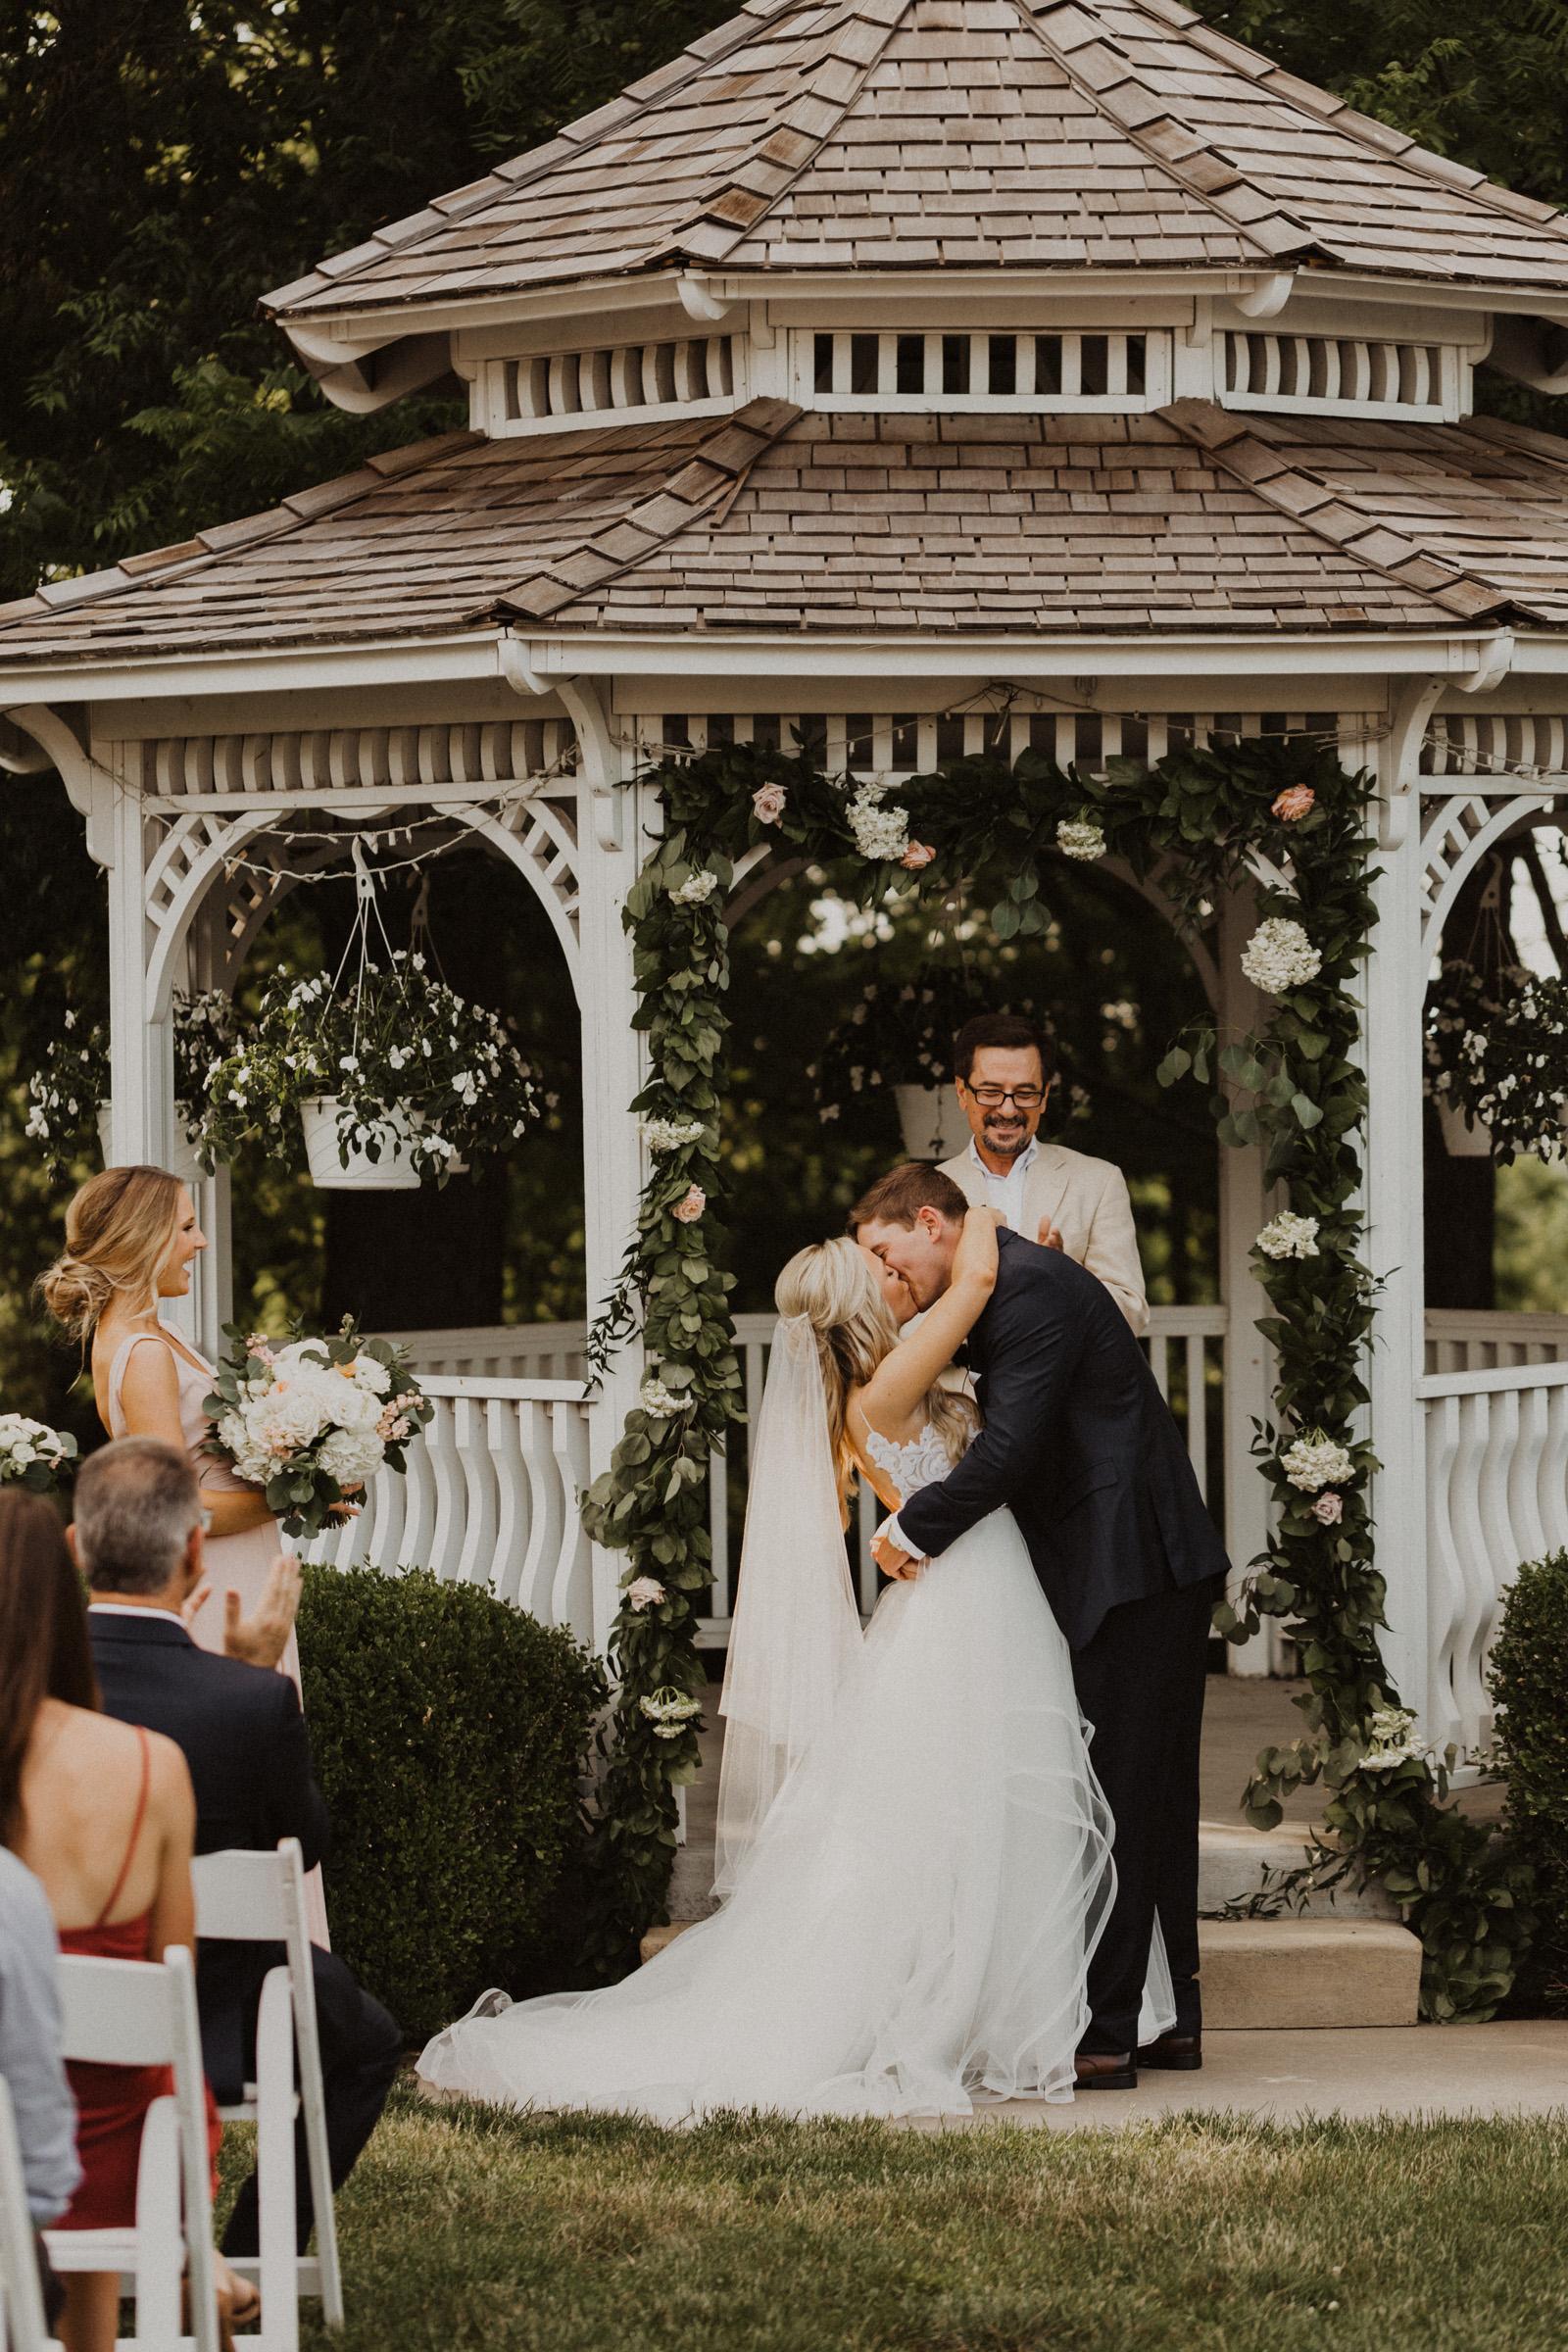 alyssa barletter photography hawthorne house summer outdoor wedding southern charm inspiration-49.jpg